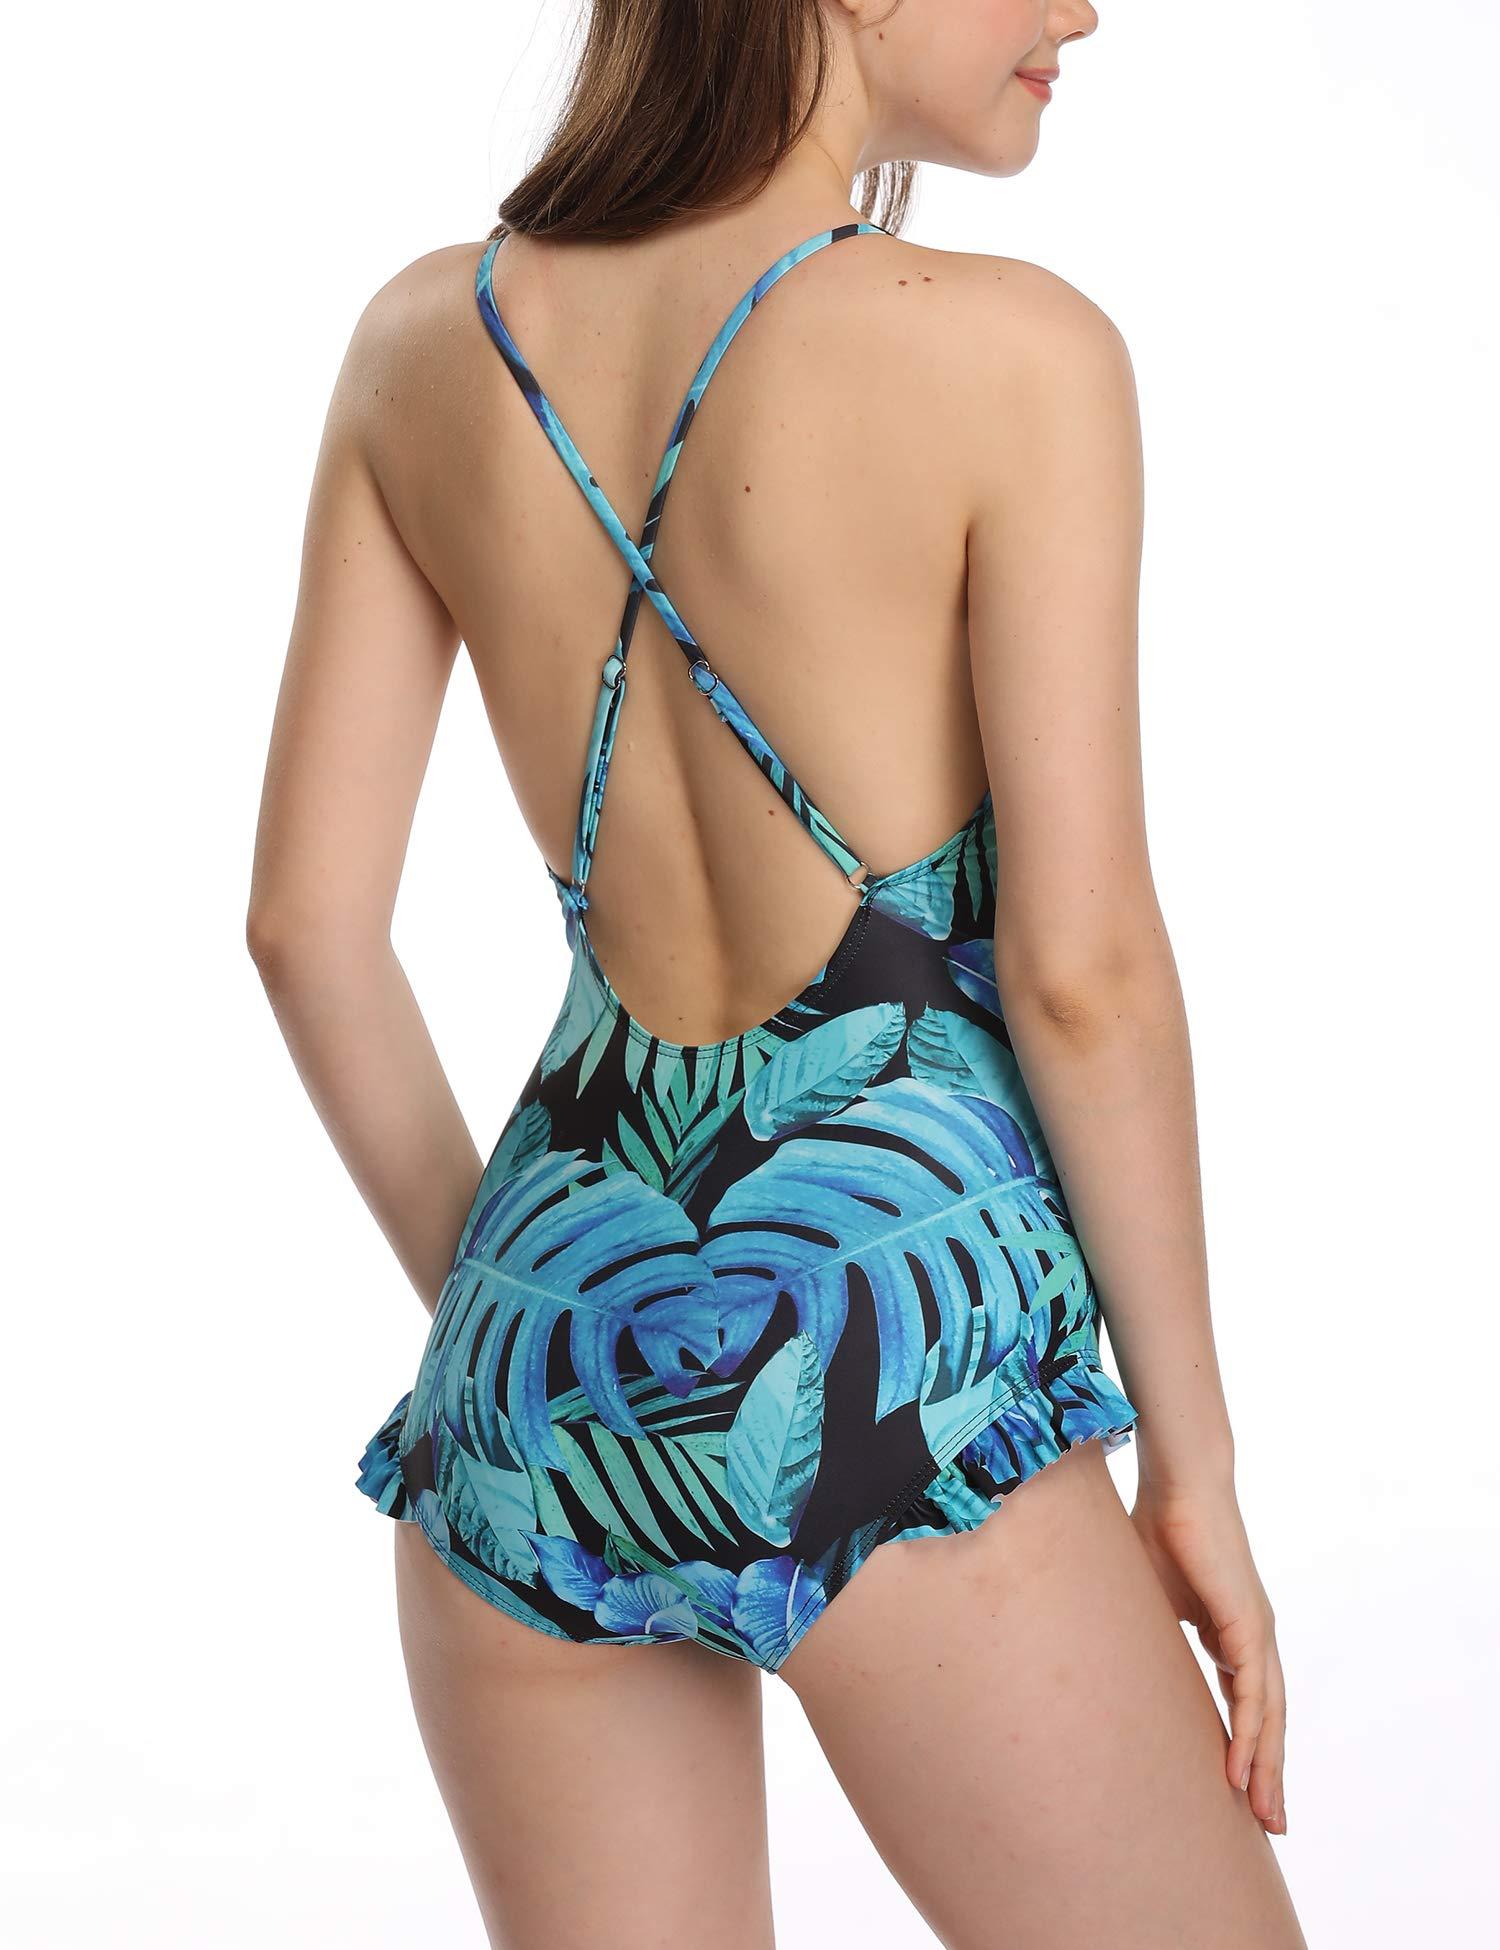 Verano Playa Women Halter One Piece Swimsuit V Neck Strap Swimwear Ruffled Flounce Tummy Control Bathing Suit